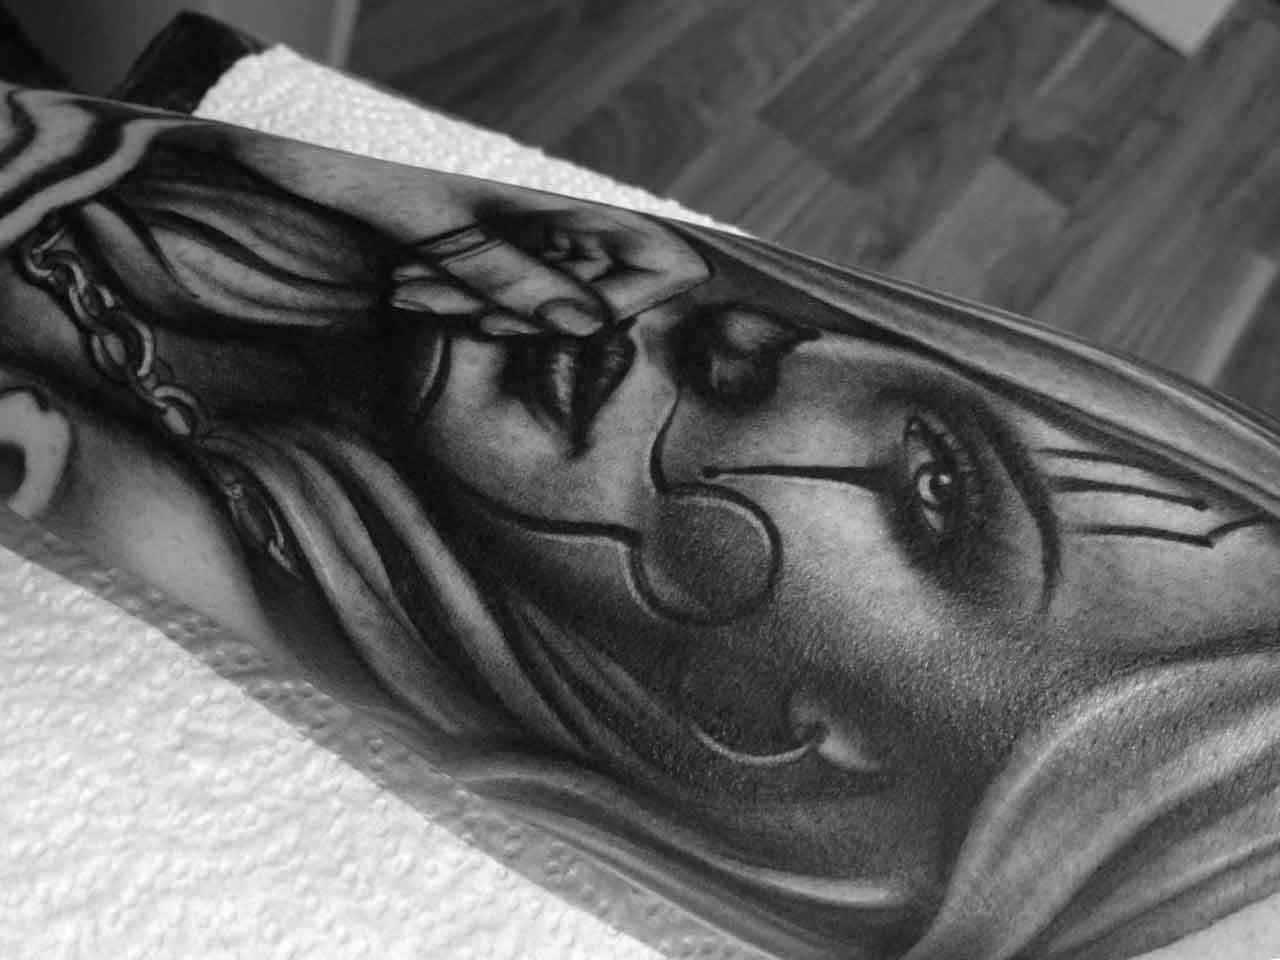 Chicano-chola-rosemary-mckevitt-tattoo-ireland